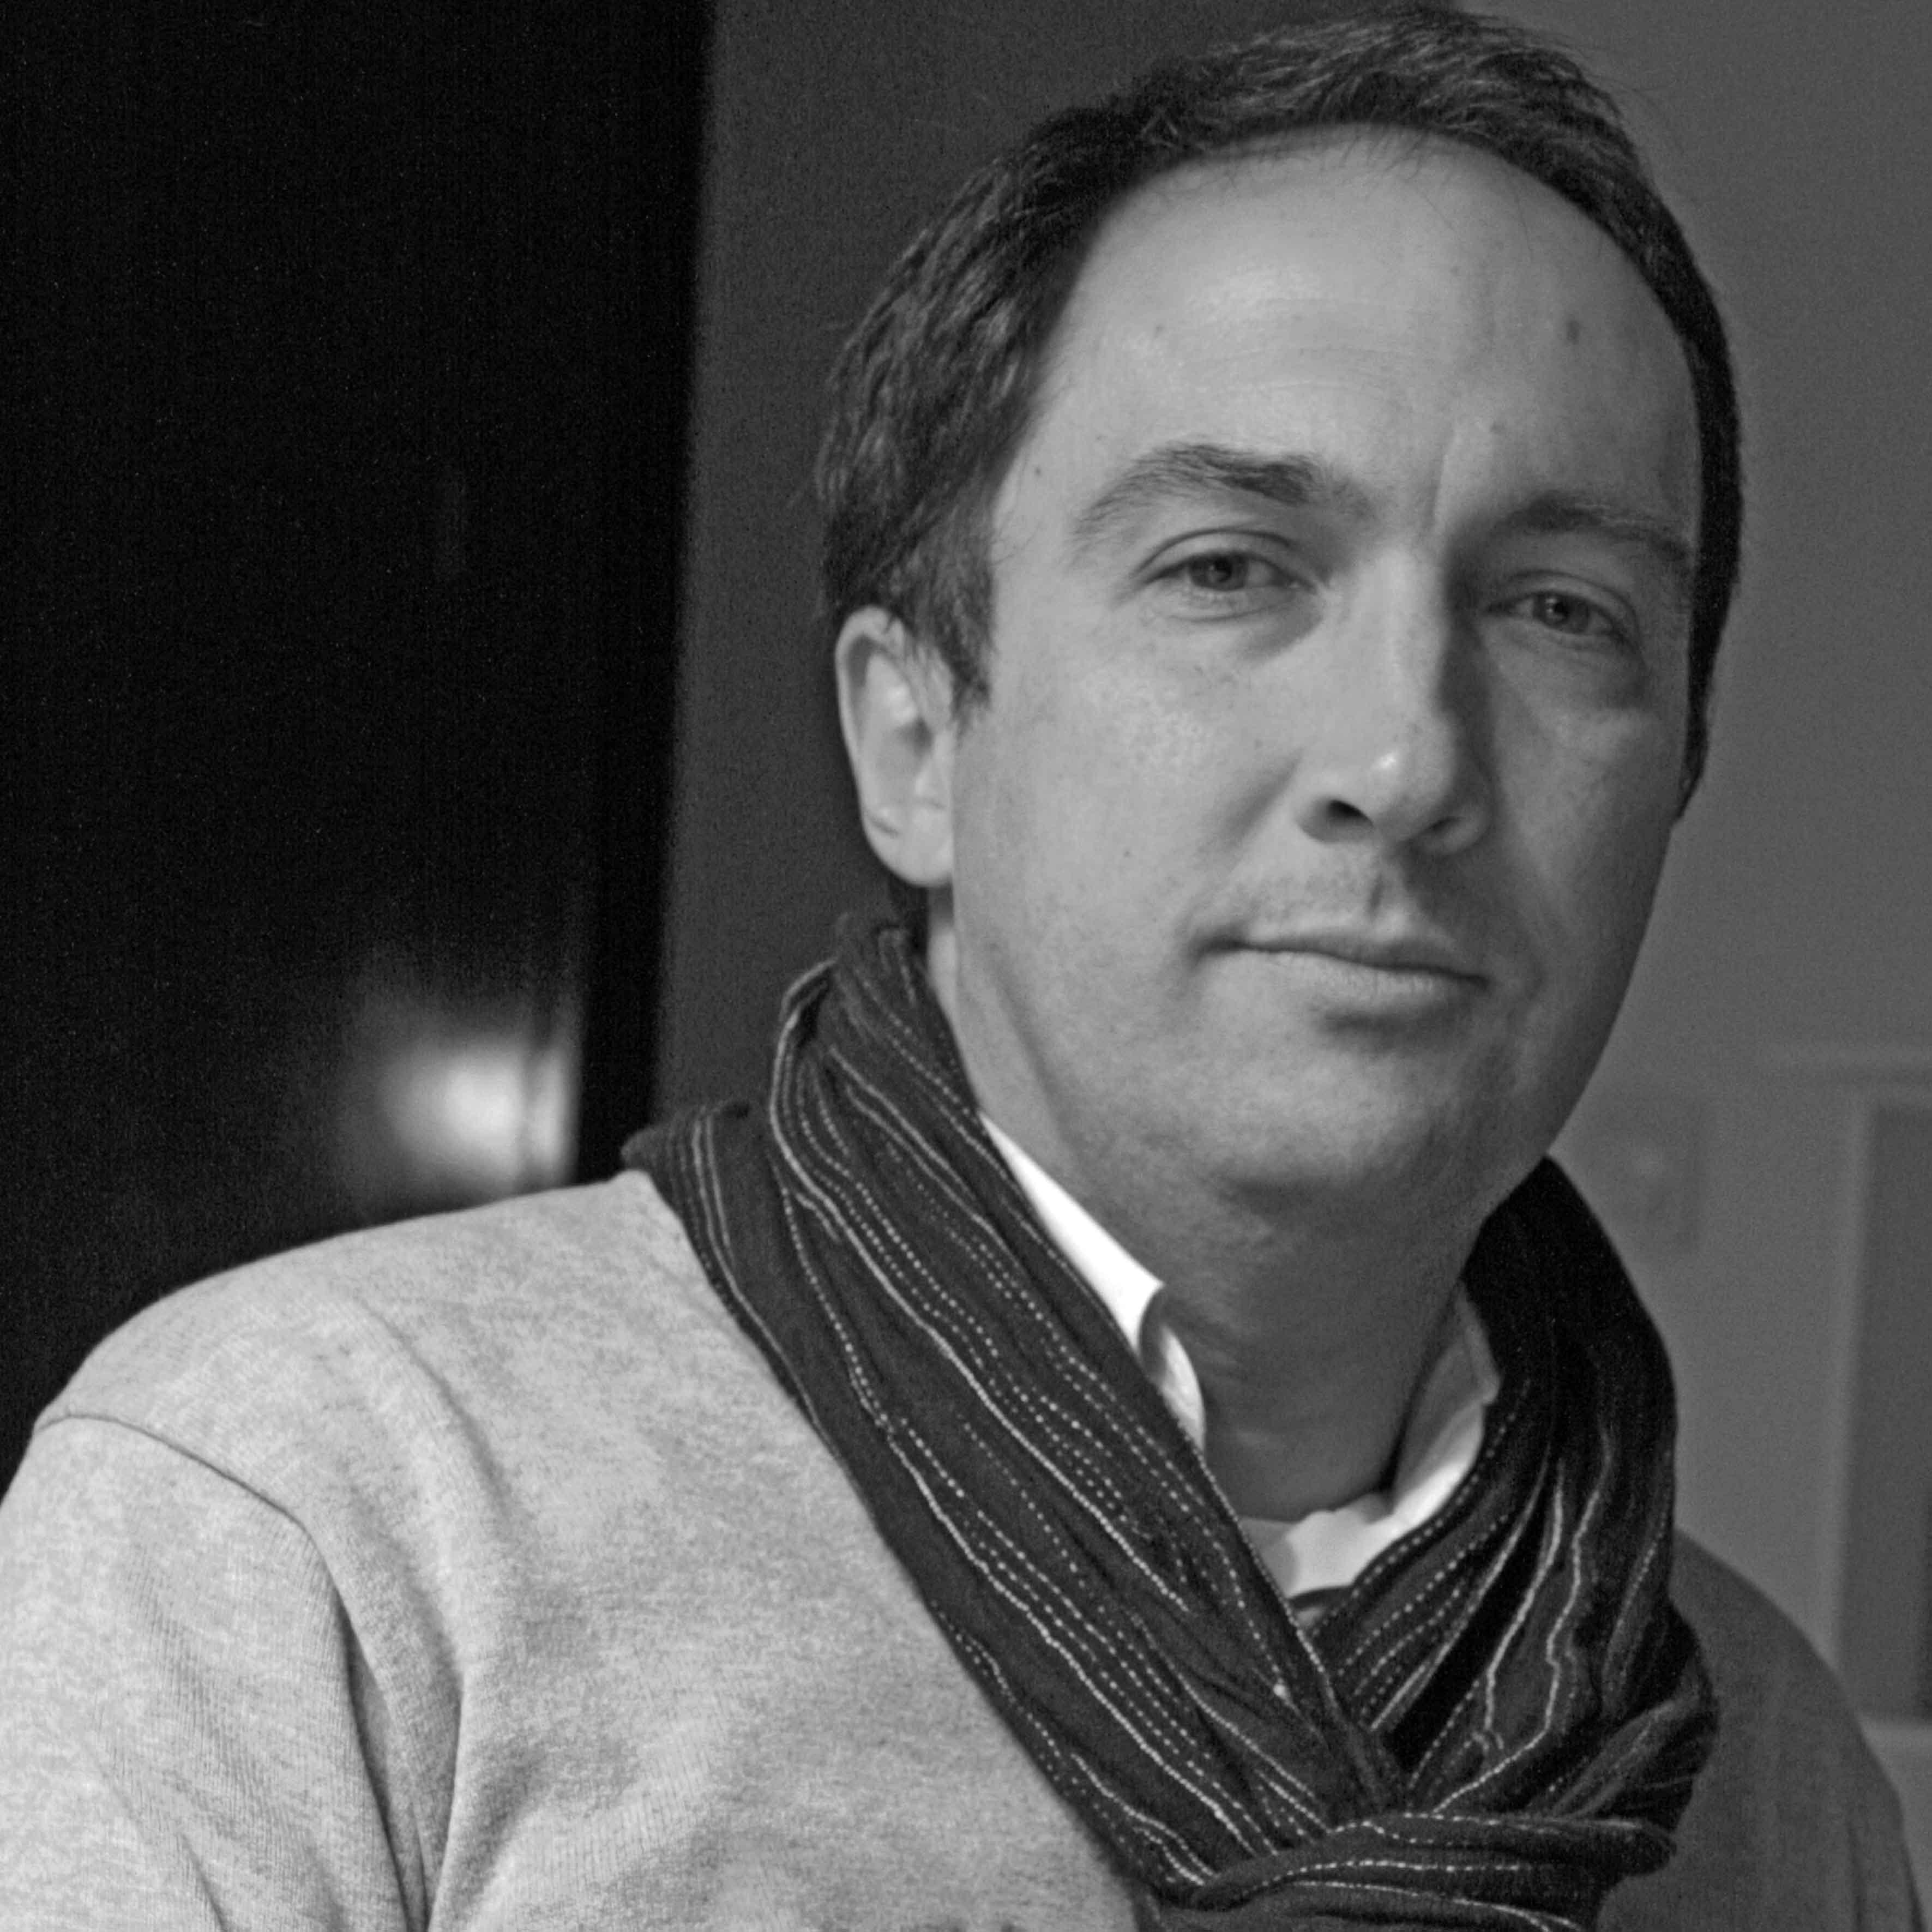 Antonio Fontes